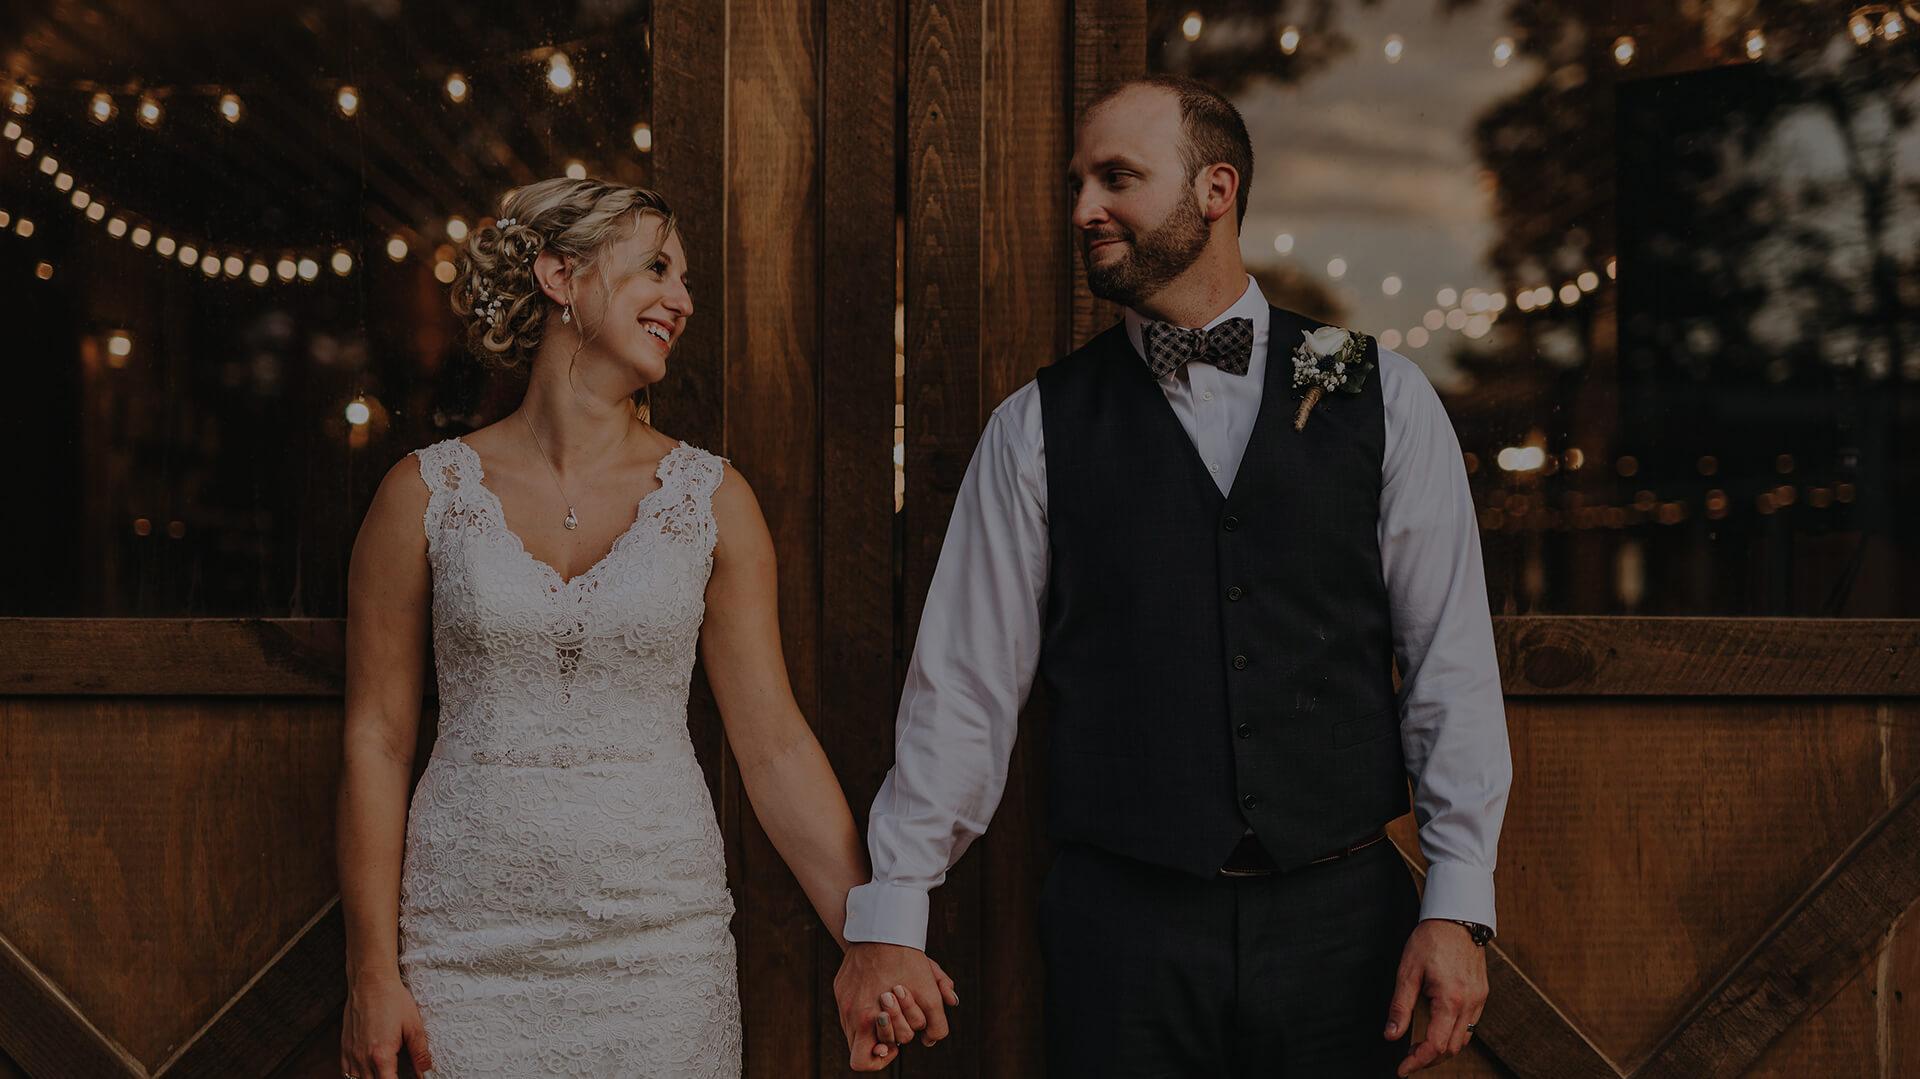 Wele To Cold Creek Farm: Farm Wedding Venues In Georgia At Reisefeber.org